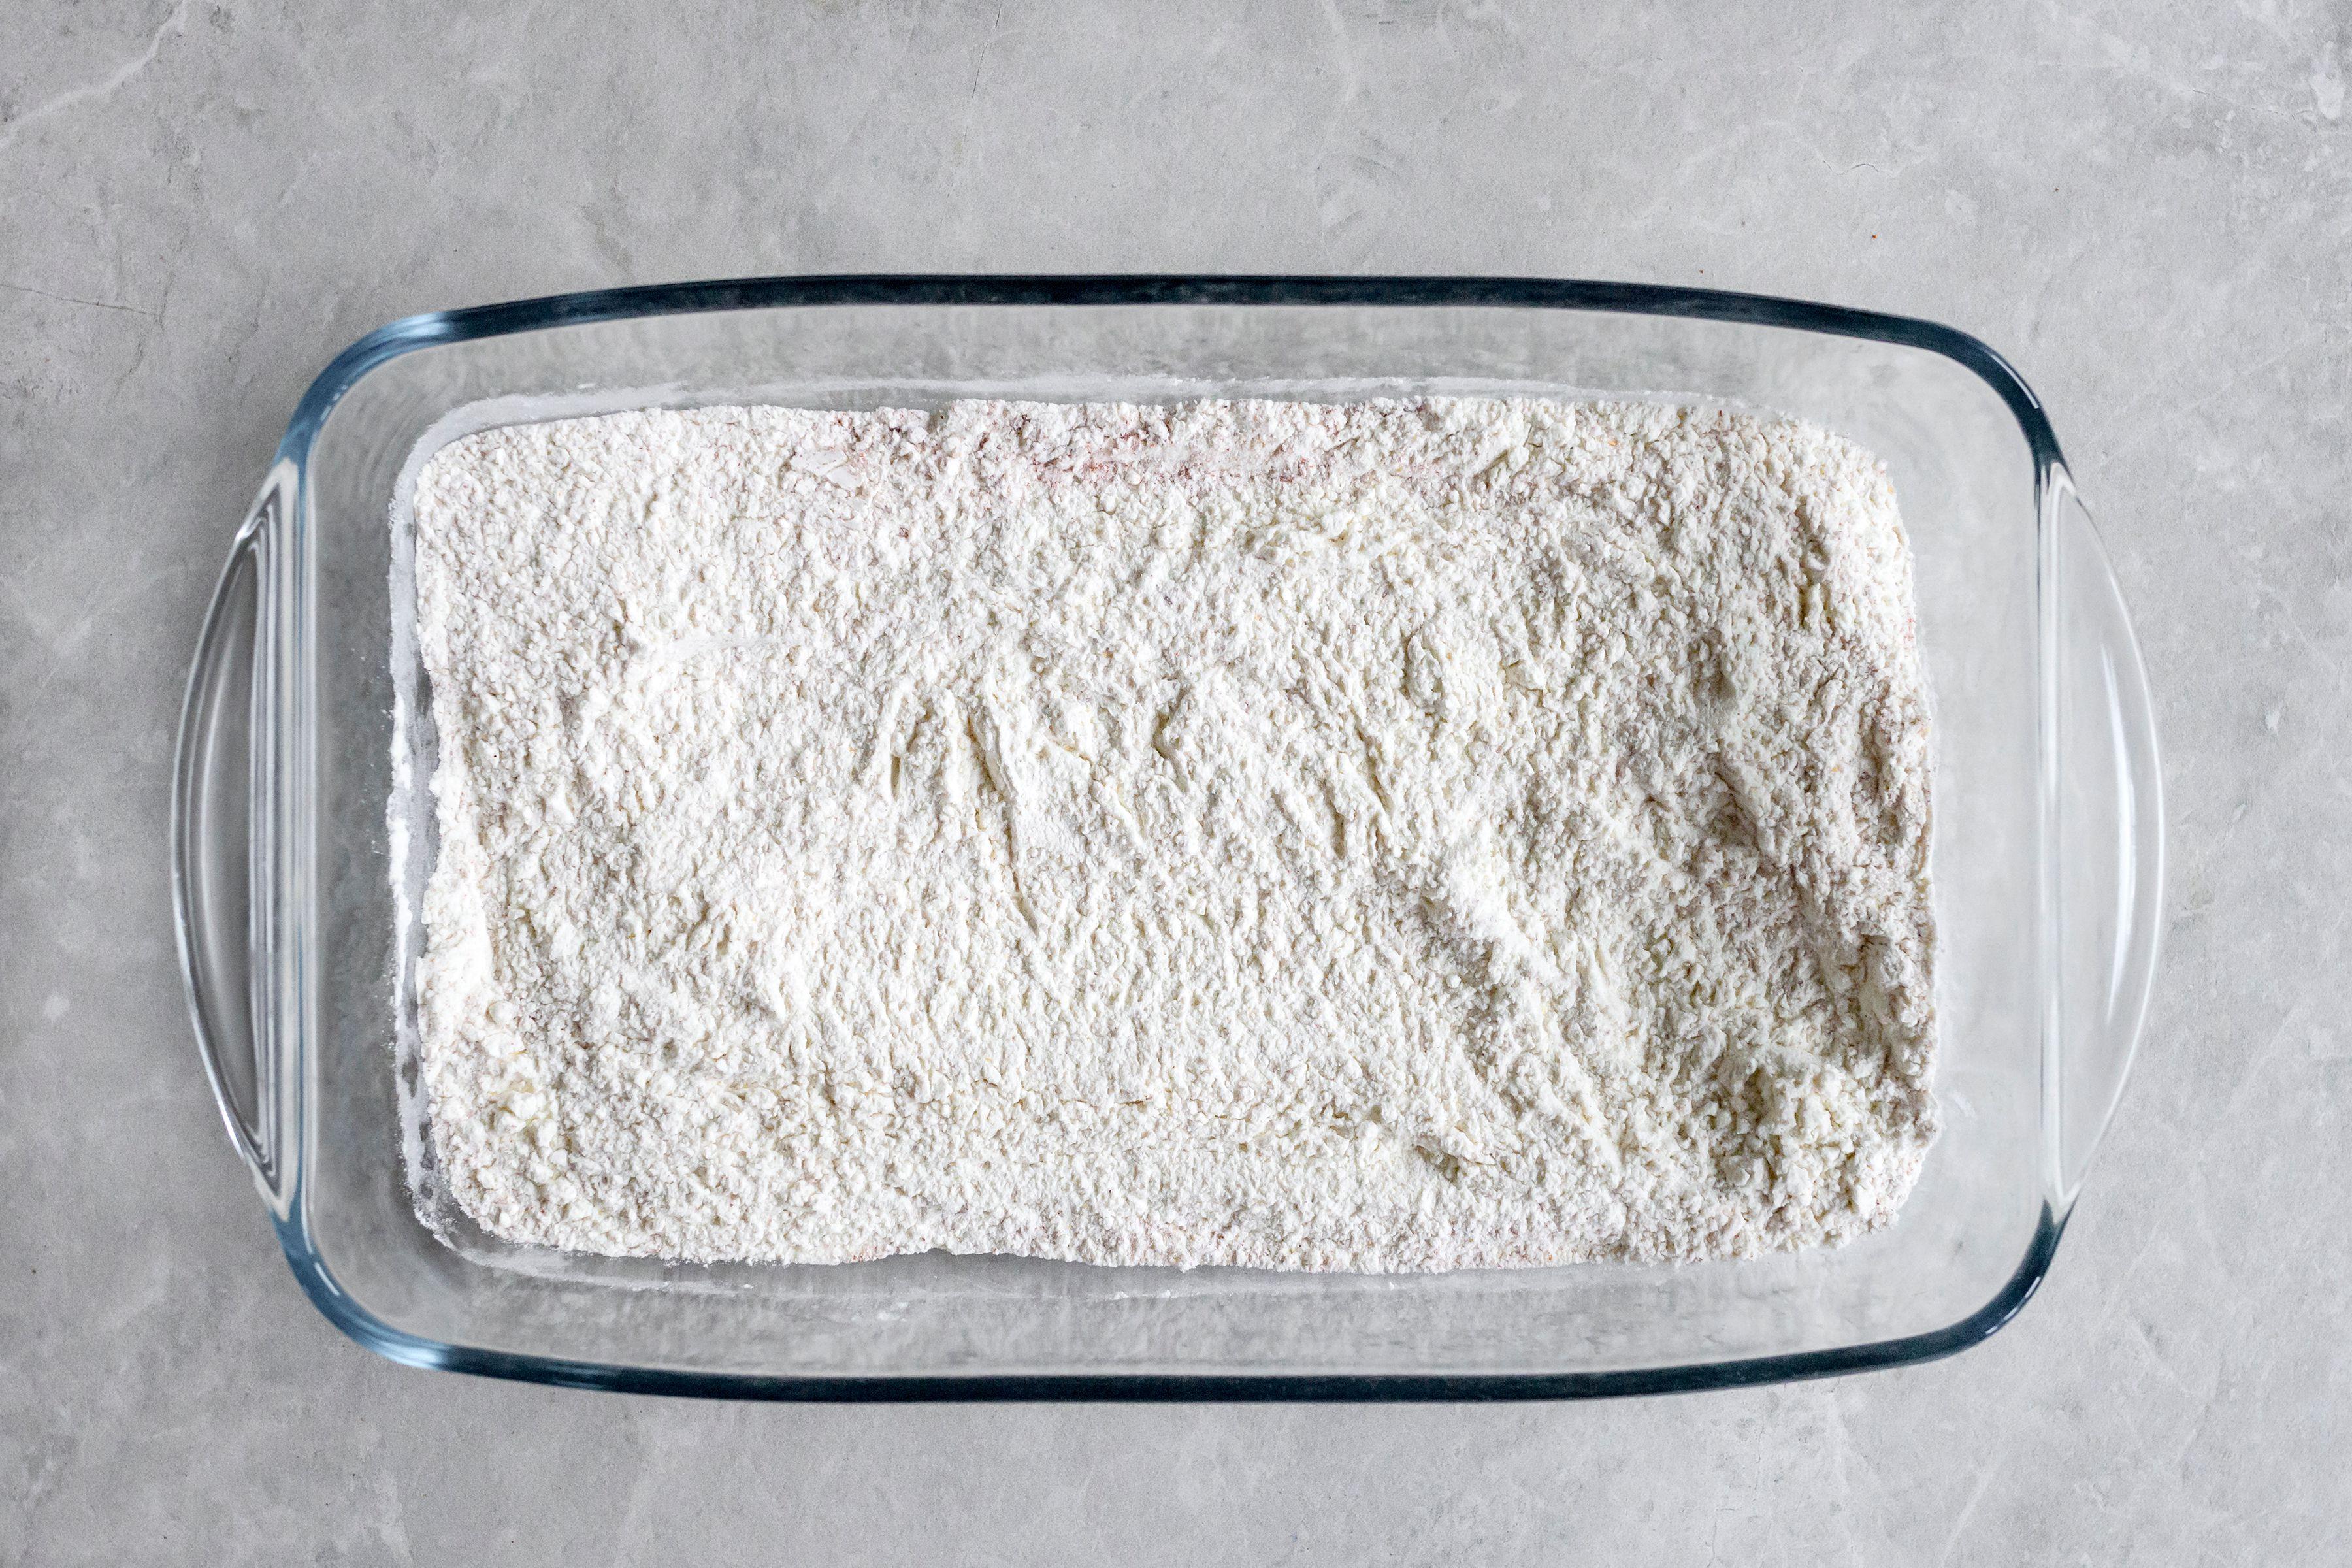 Flour lining bottom of baking dish